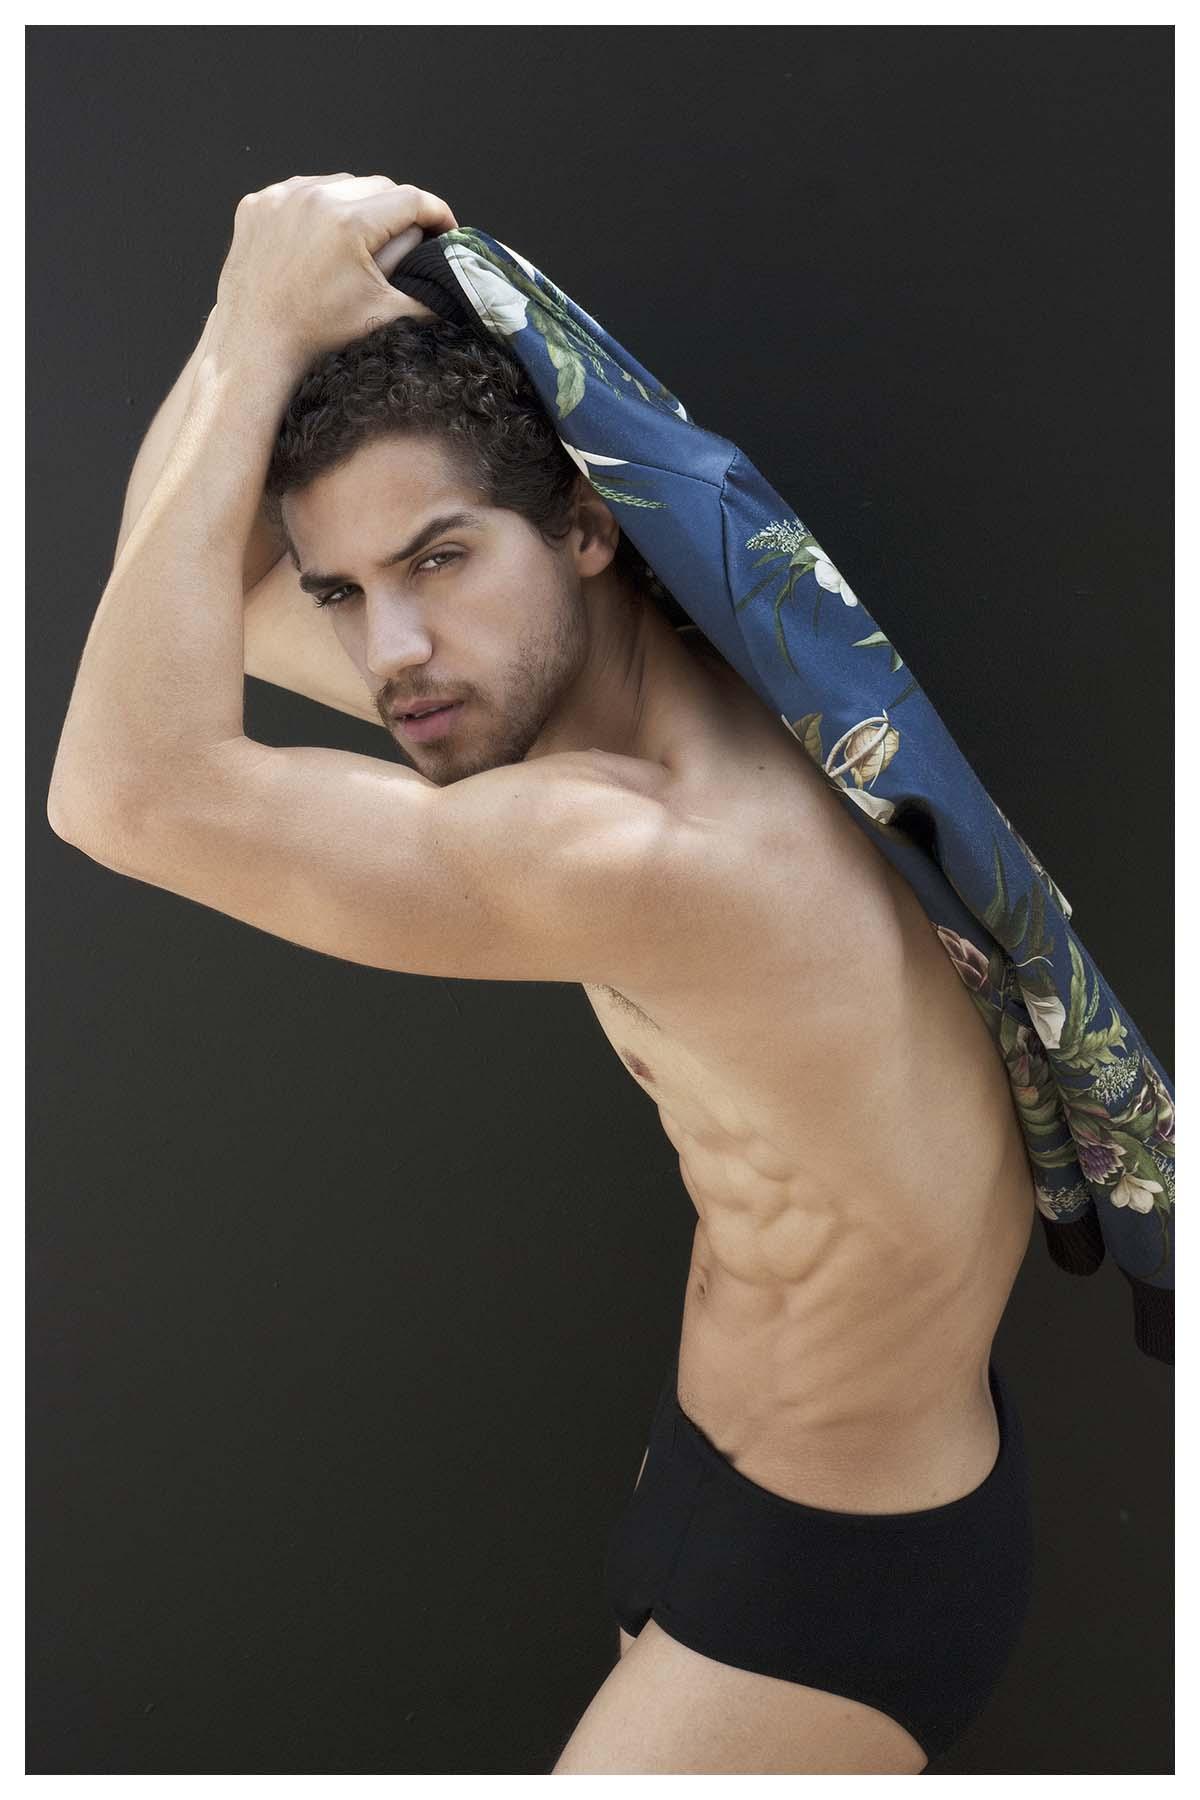 Marlon Almeida by Rodrigo Moura for Brazilian Male Model